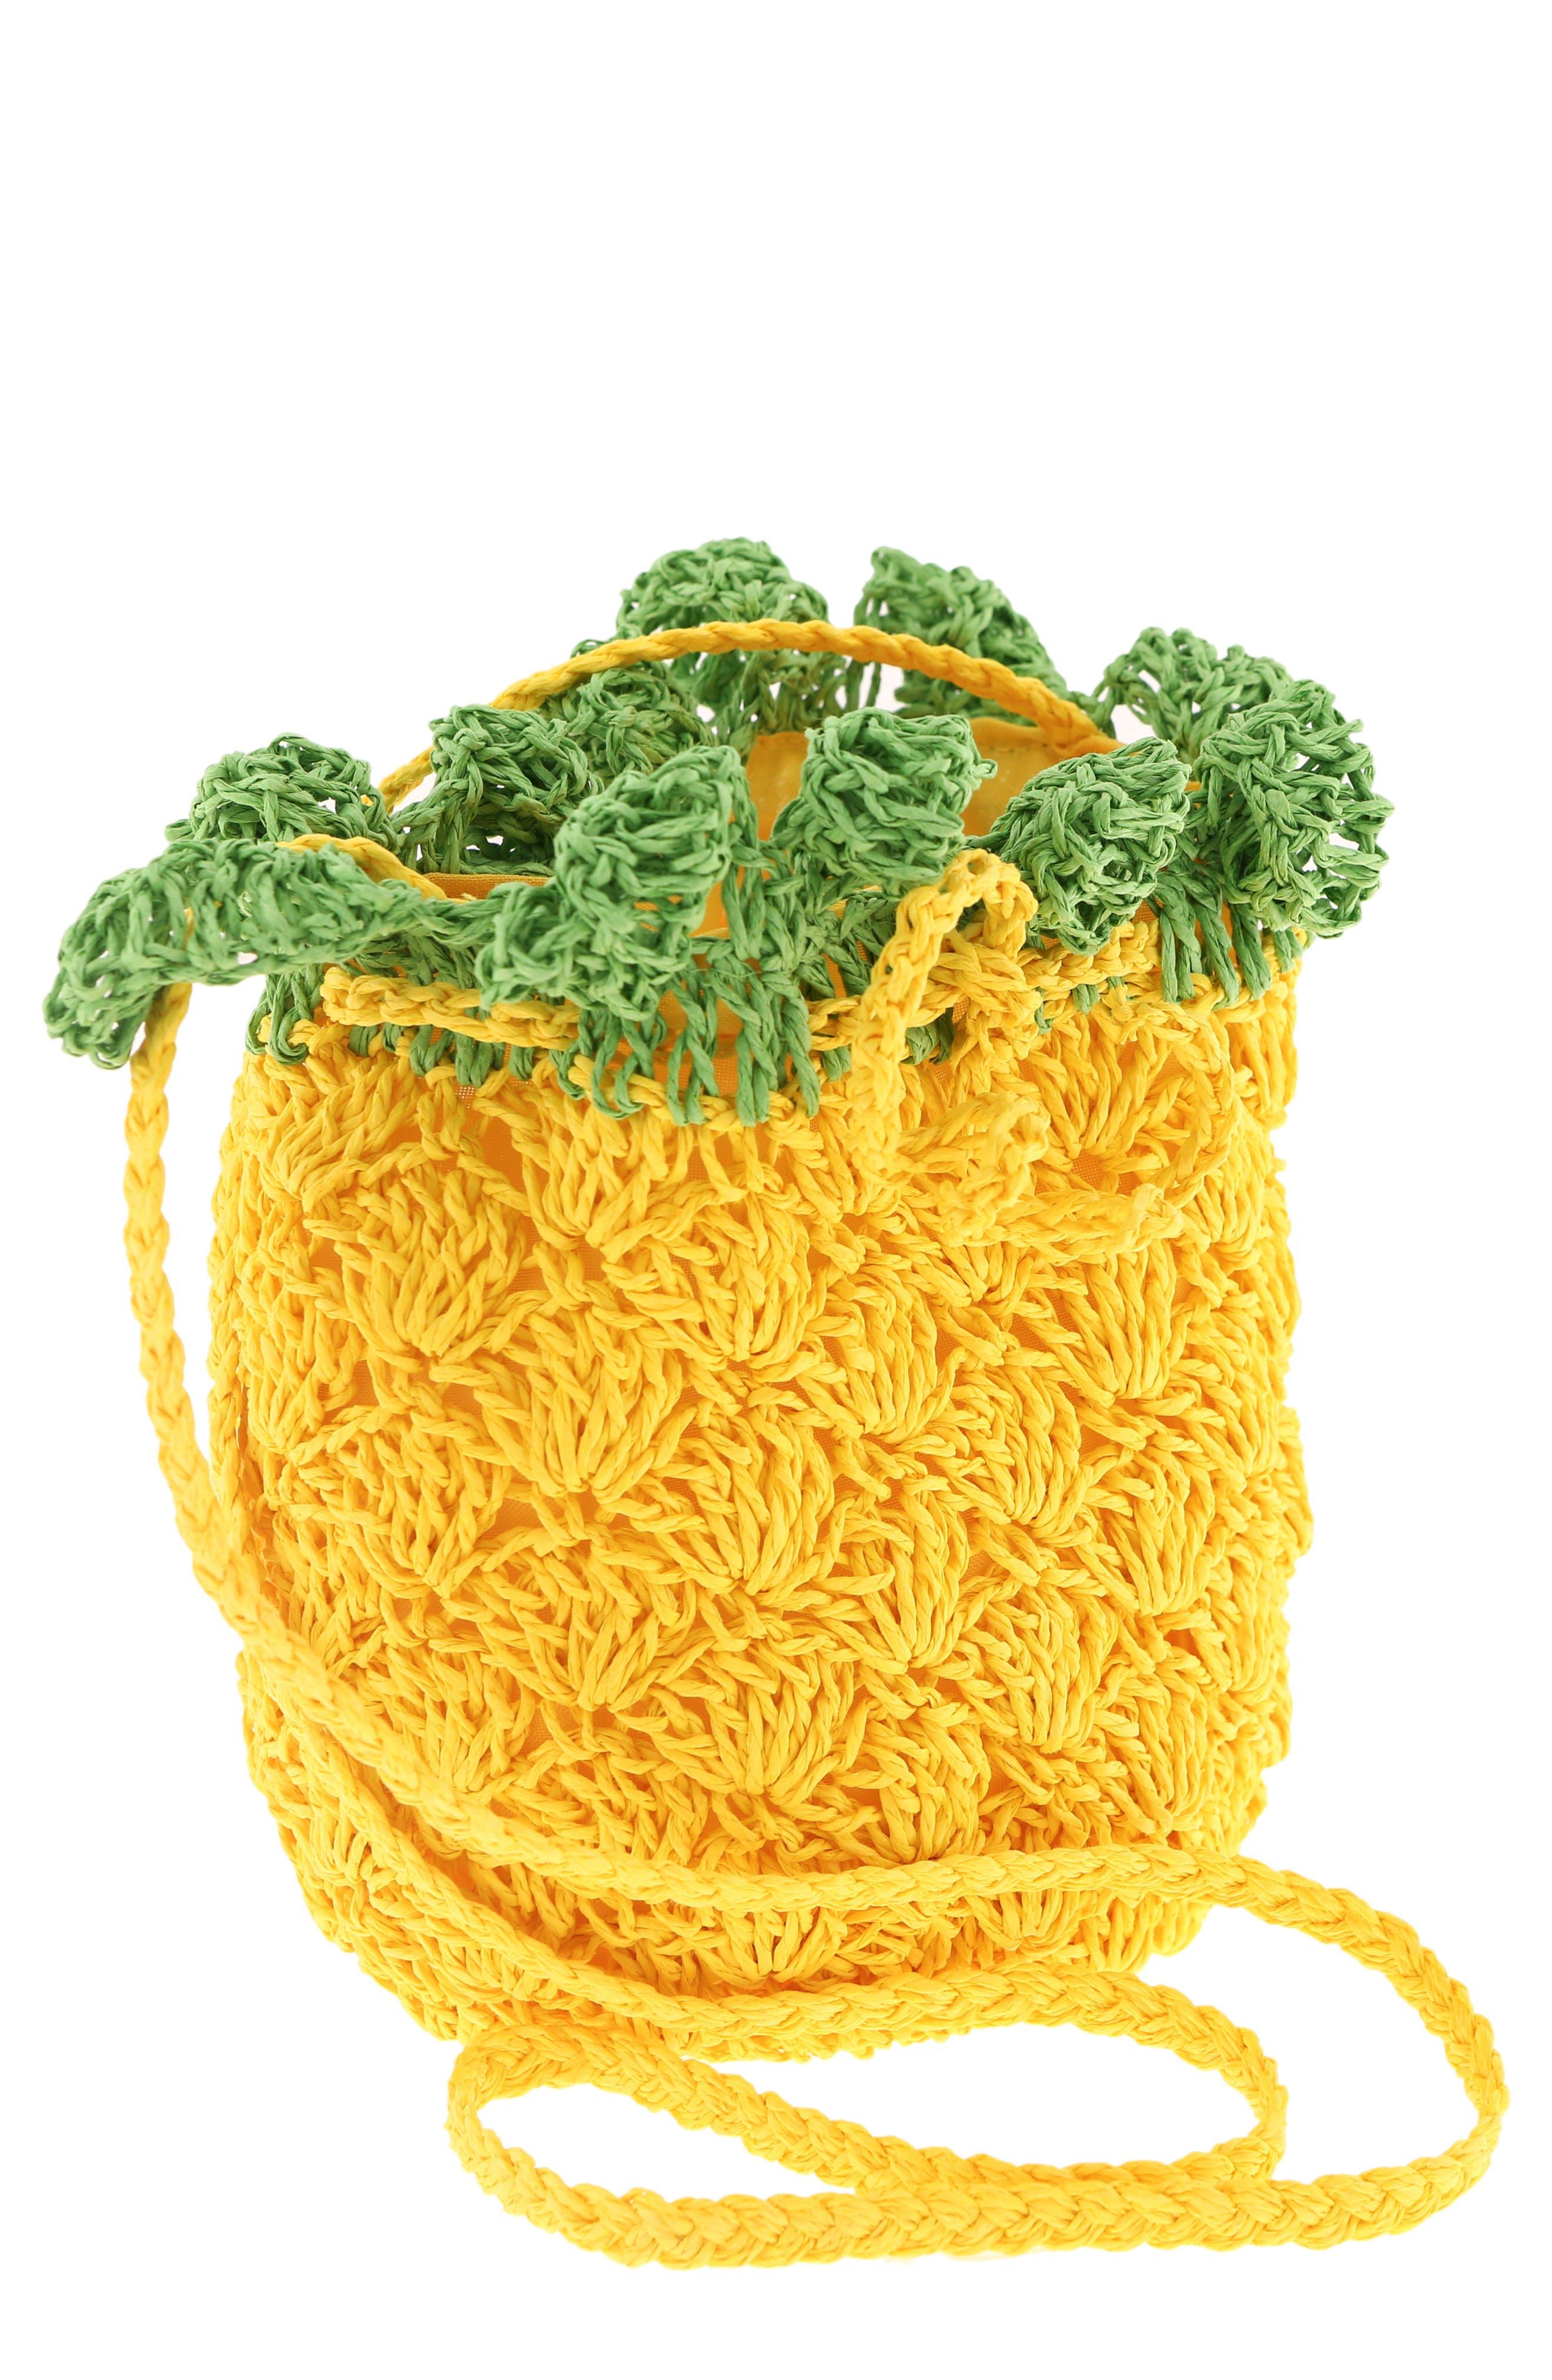 CAPELLI NEW YORK, Crochet Pineapple Crossbody Bag, Main thumbnail 1, color, YELLOW COMBO